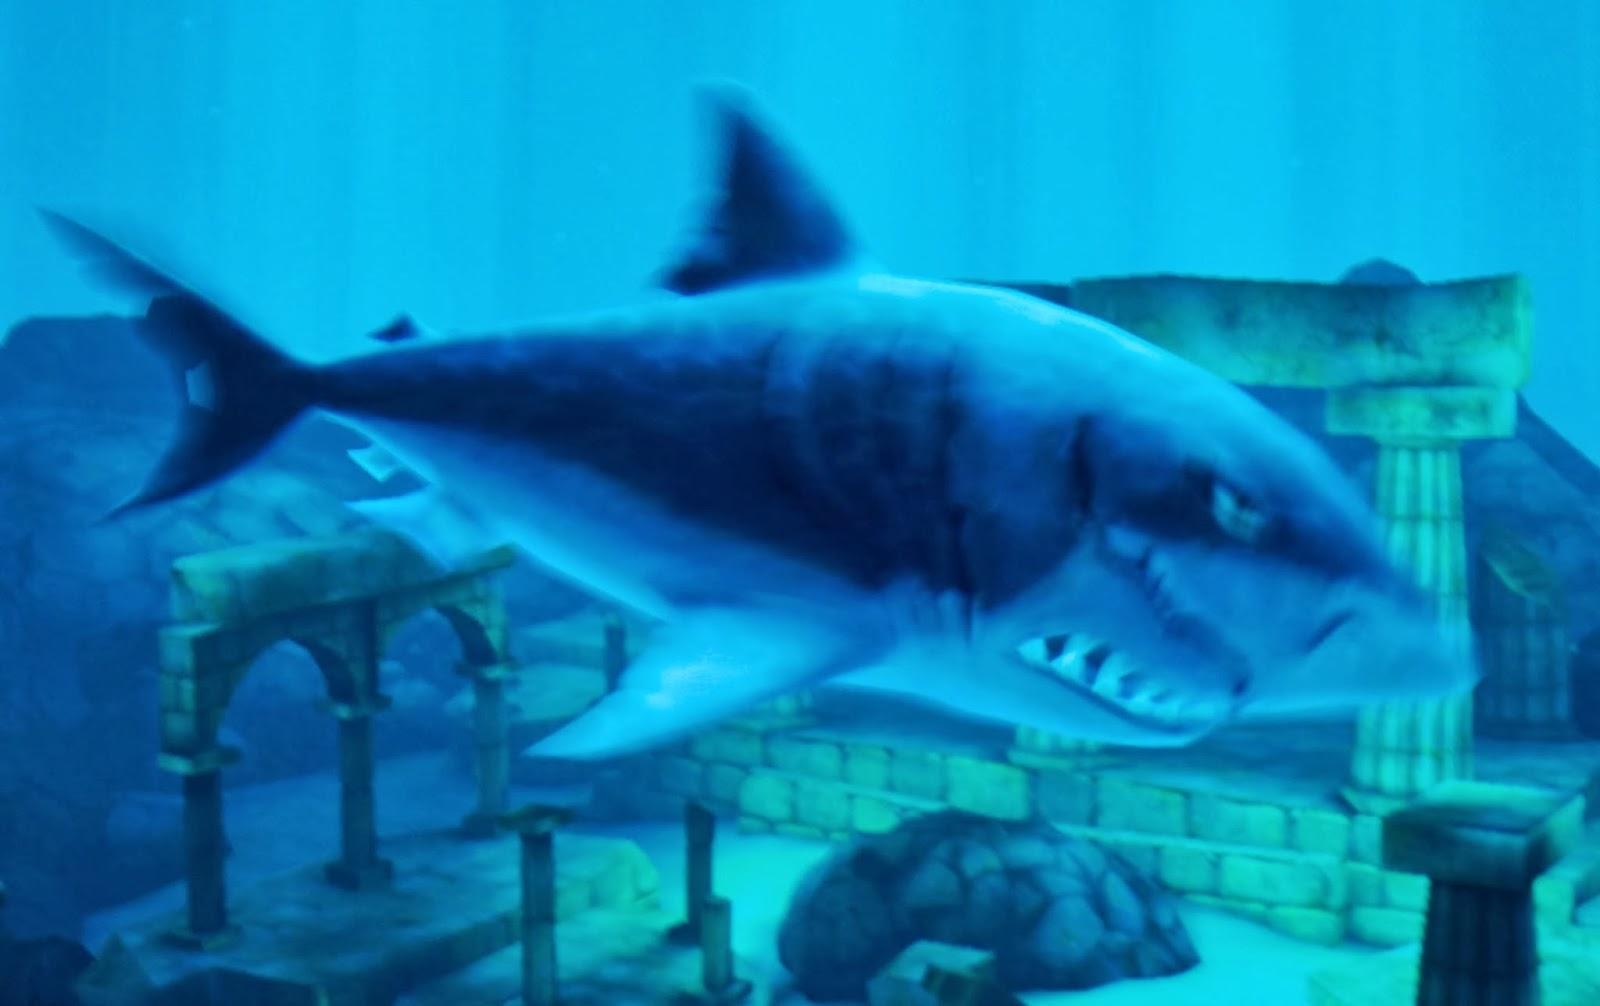 Hungry shark evolution megalodon vs giant crab - photo#35